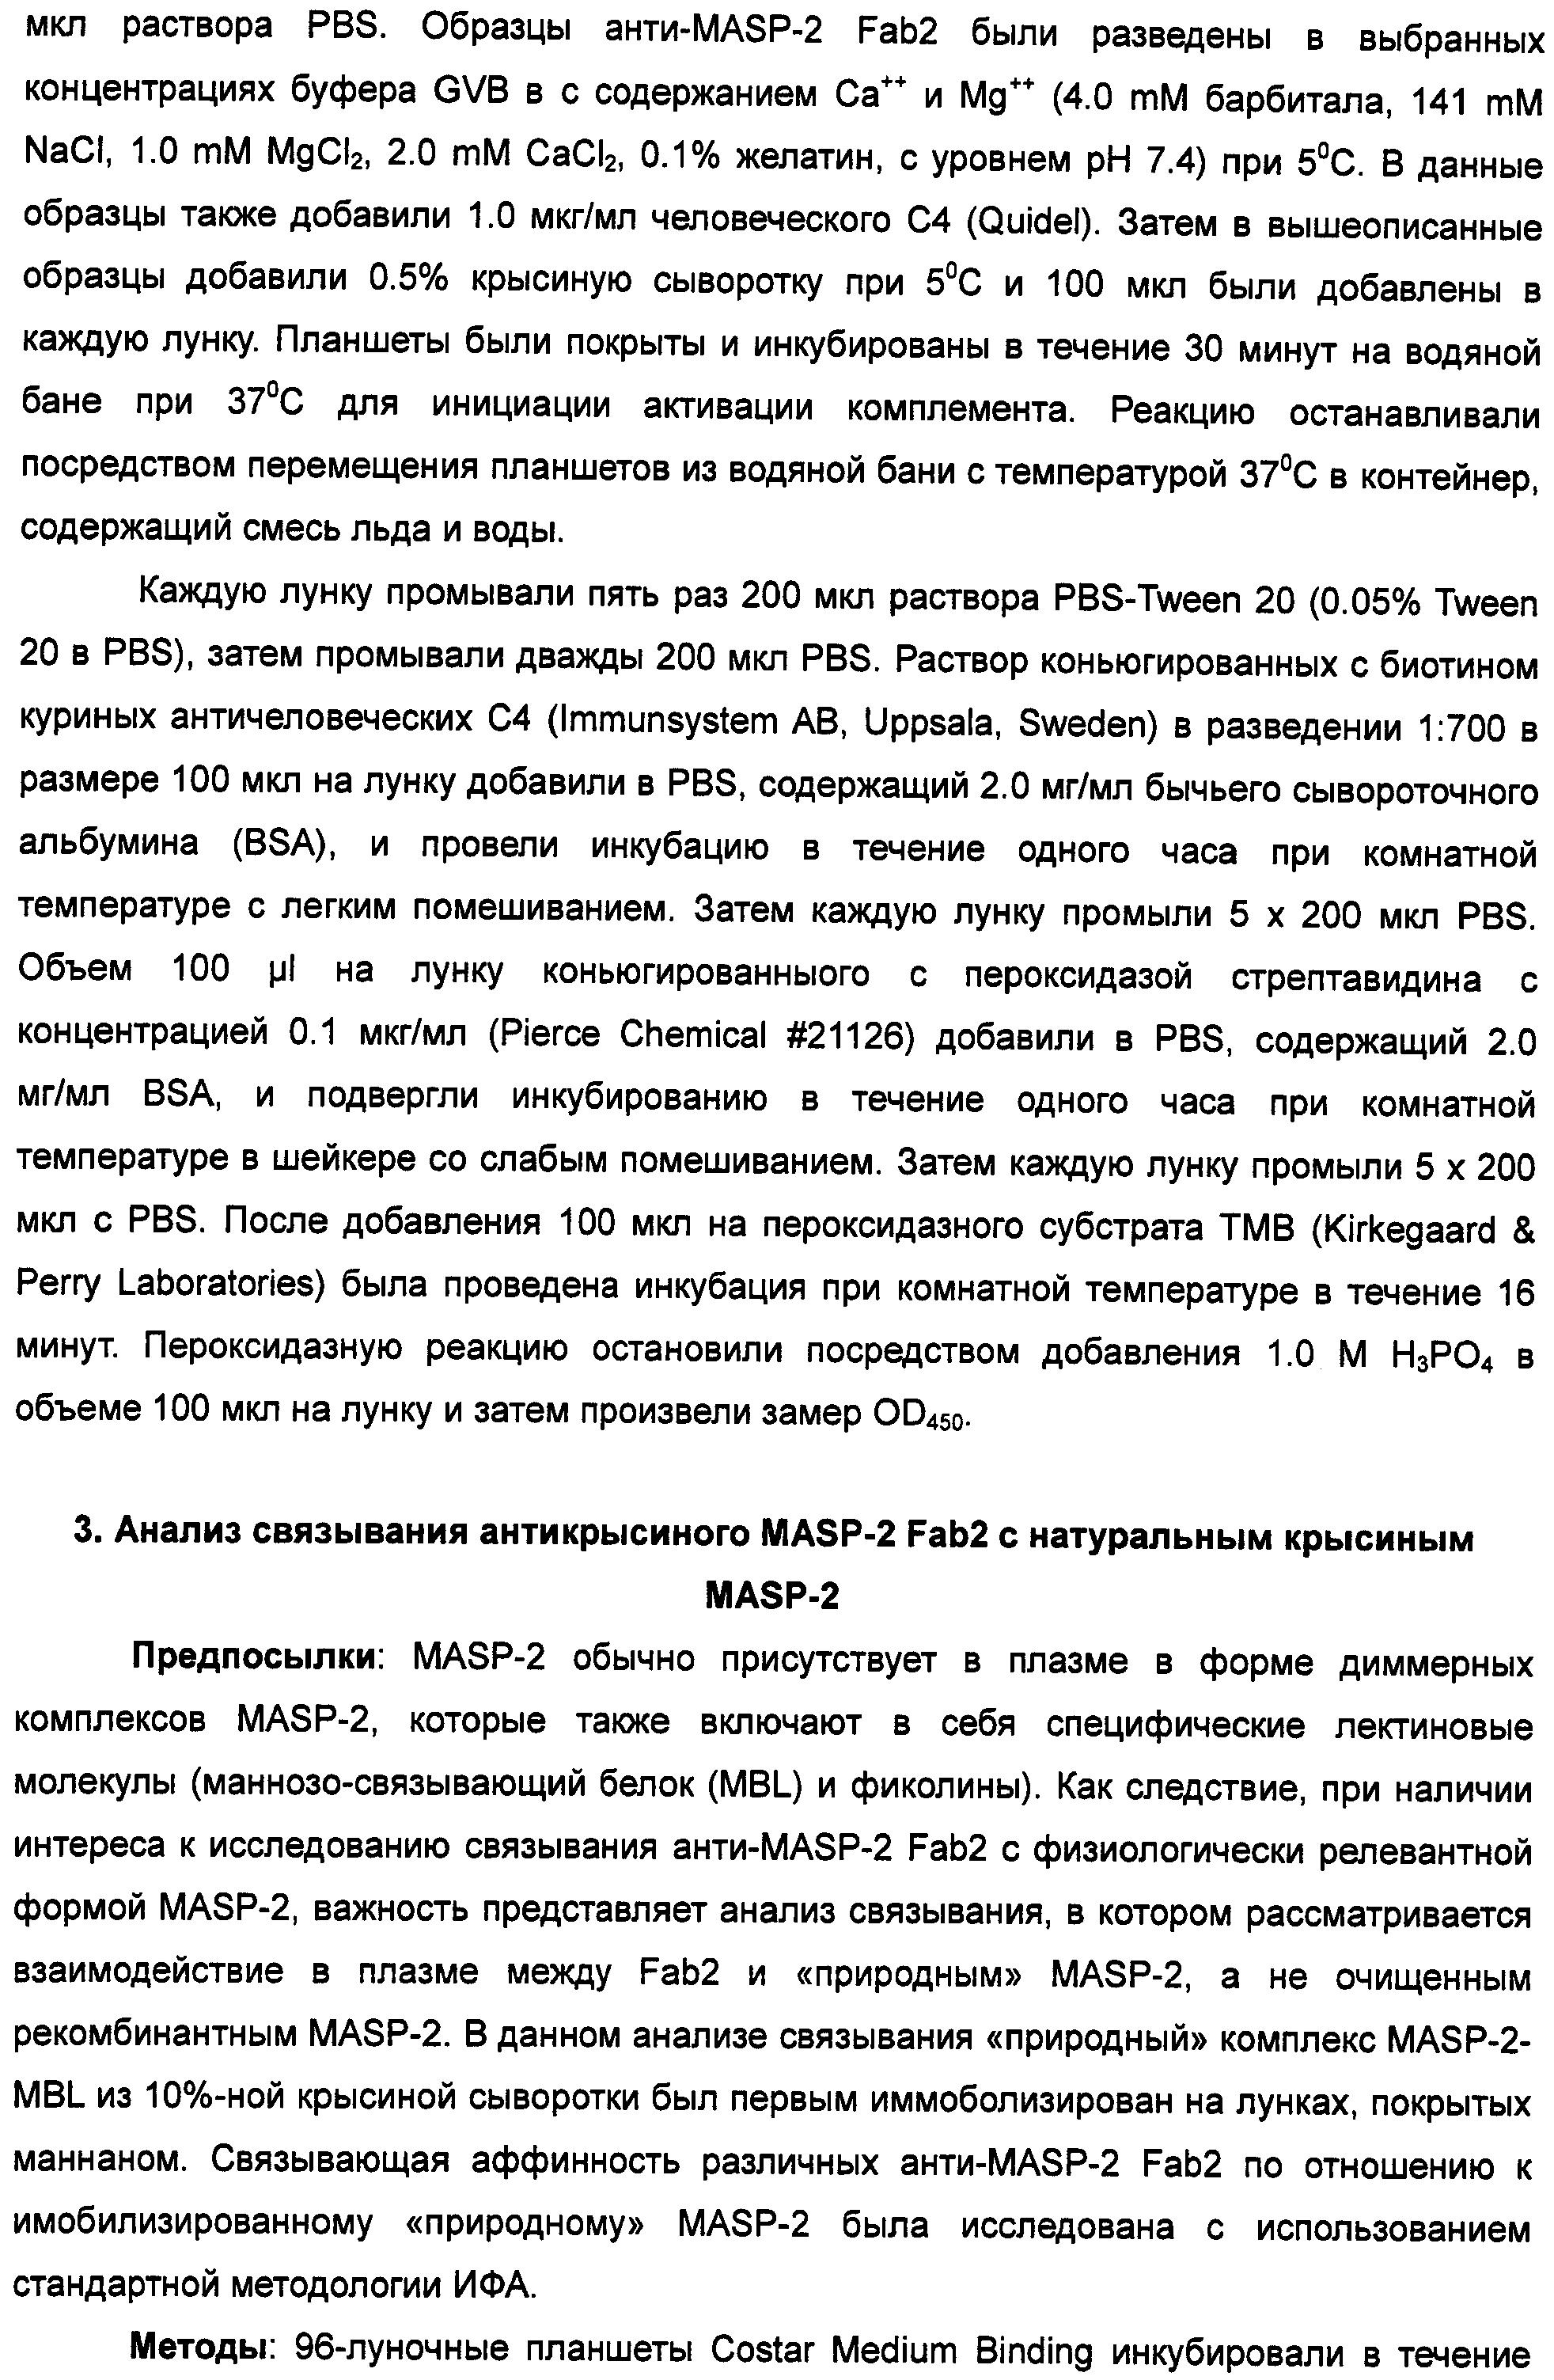 Figure 00000157